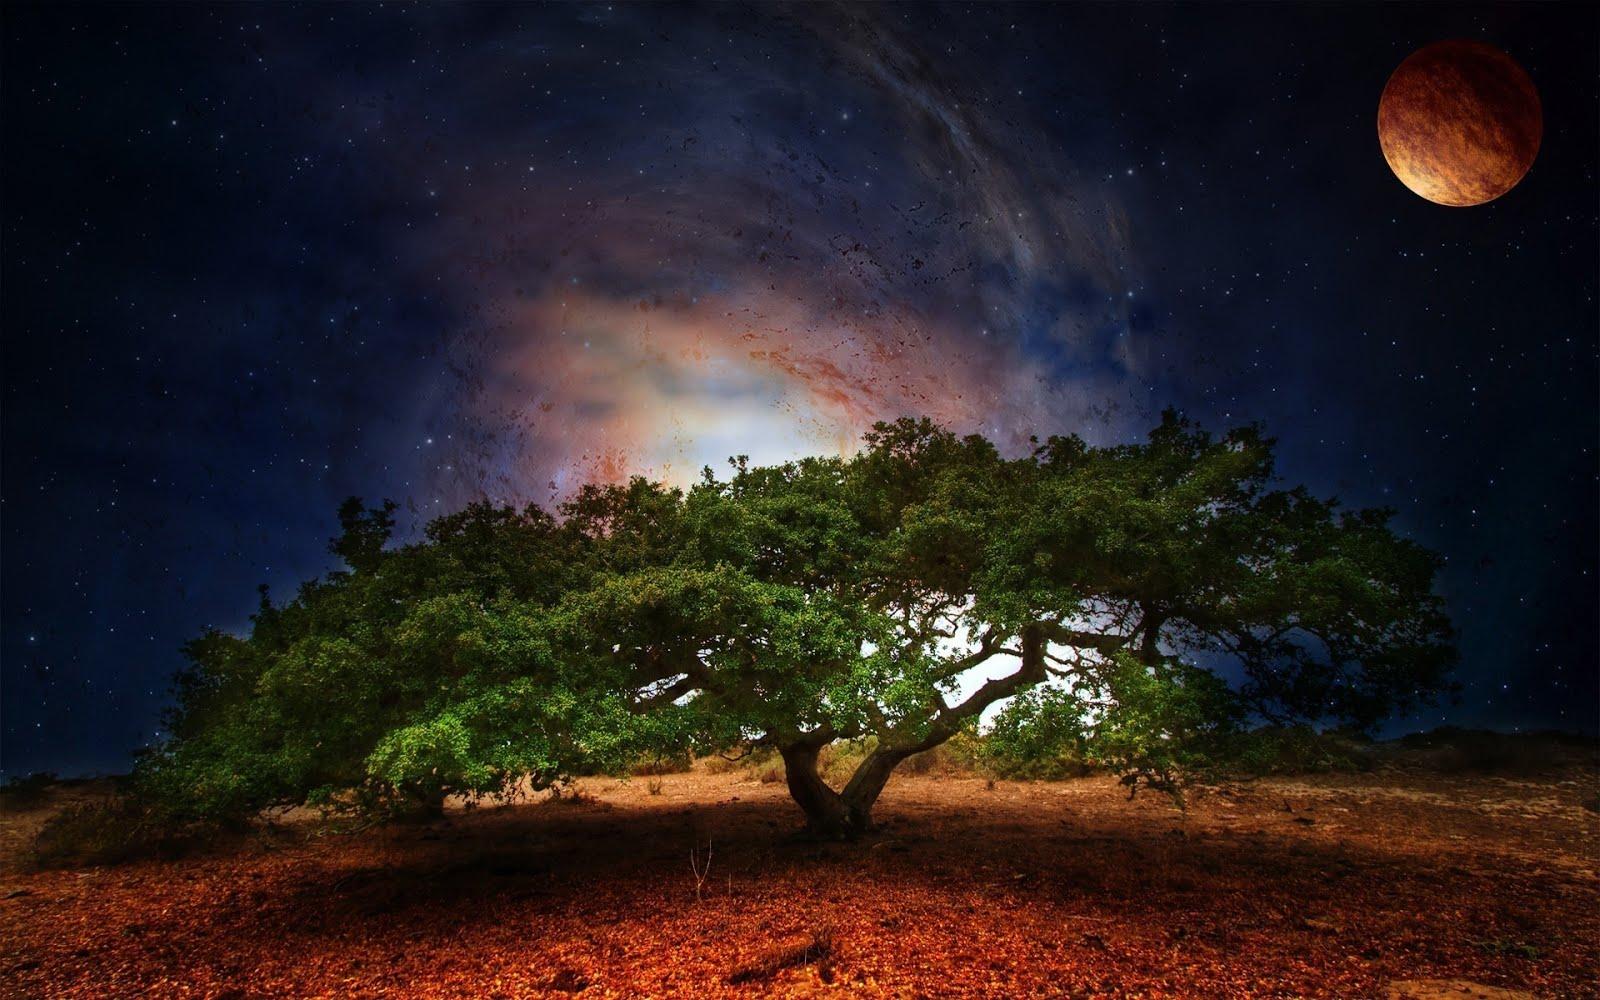 http://4.bp.blogspot.com/-gEI7Lg69u8E/UHyvGRi83pI/AAAAAAABLo0/wpdYcHvdCk0/s1600/giant-tree-1920x1200-wallpaper-paisajes-fantasticos-e-increibles.jpg